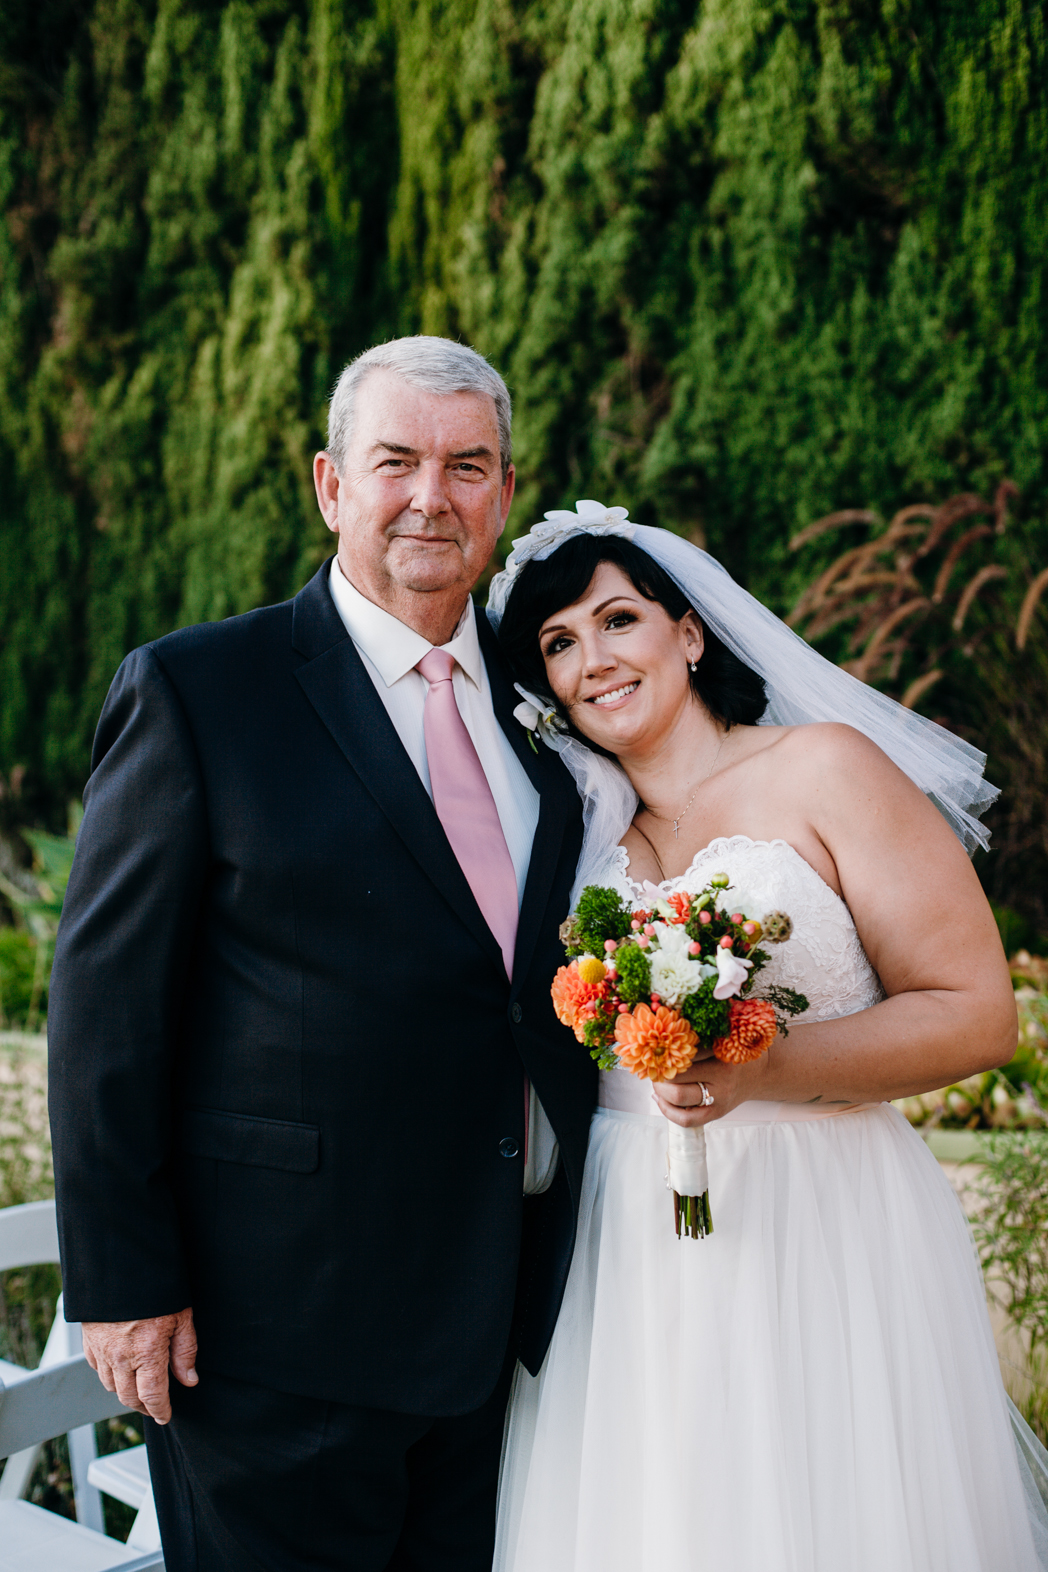 KaraNixonWeddings-LosAngeles-Wedding-18.jpg